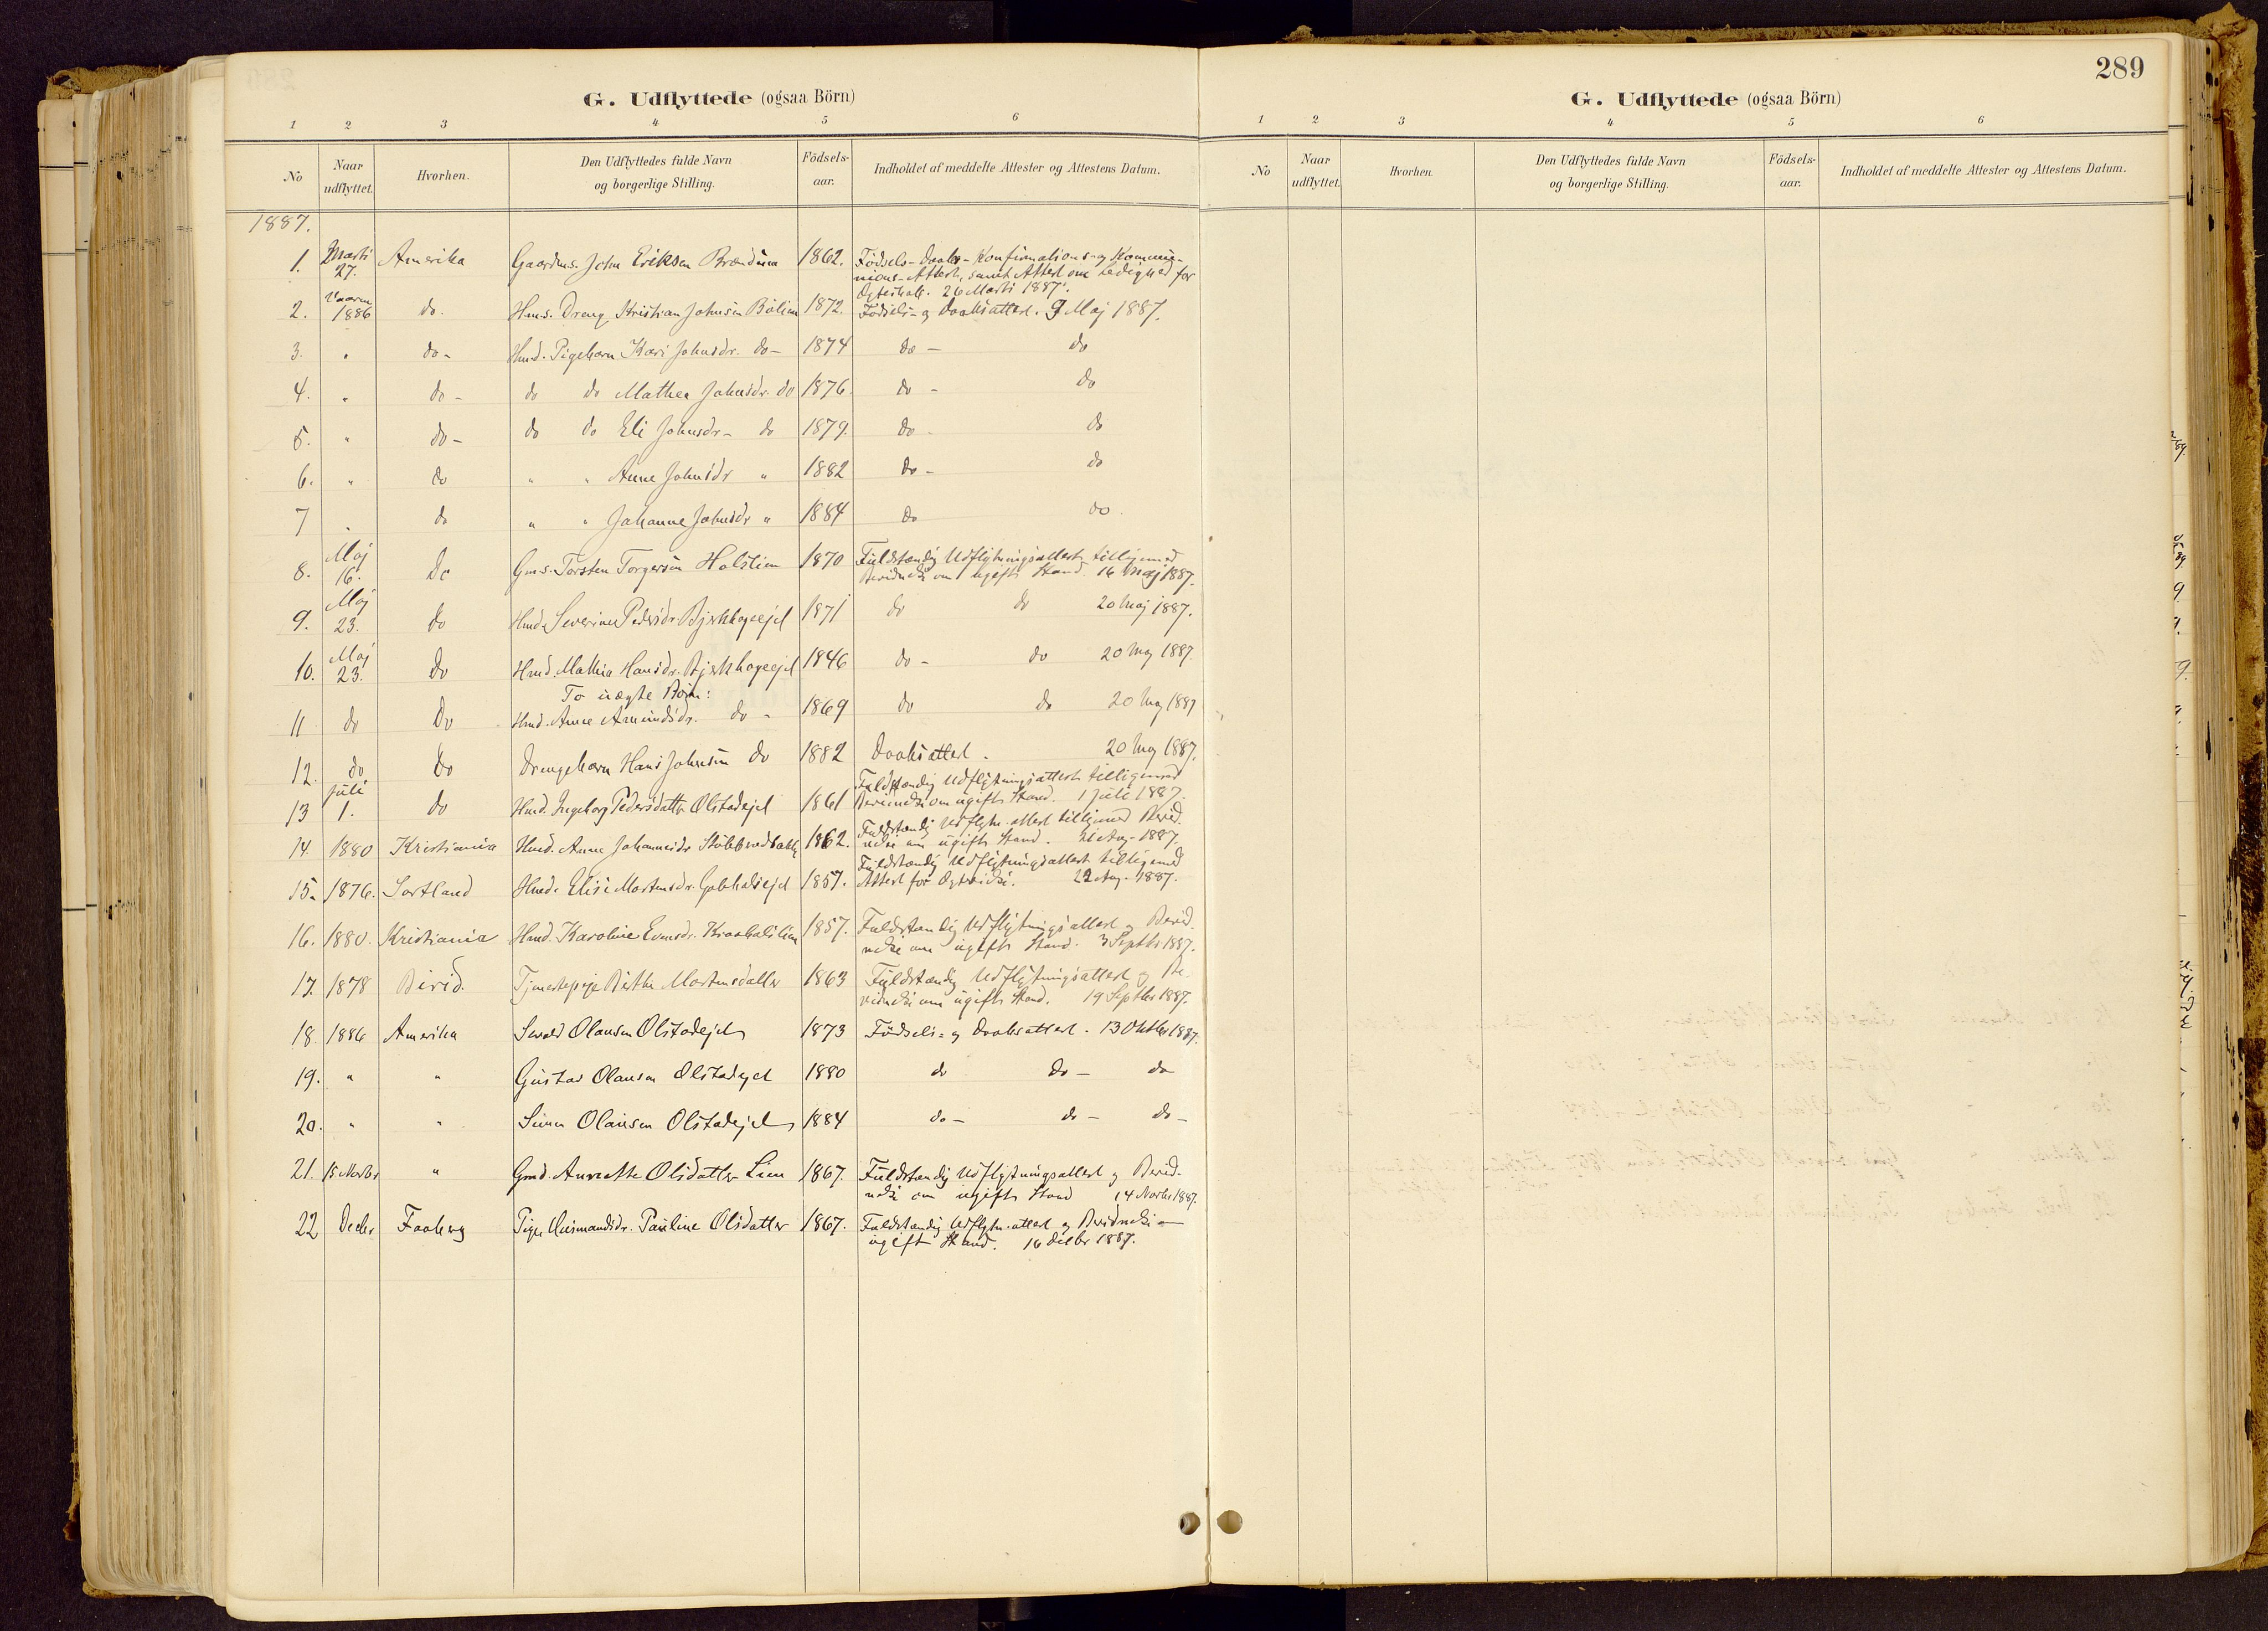 SAH, Vestre Gausdal prestekontor, Ministerialbok nr. 1, 1887-1914, s. 289